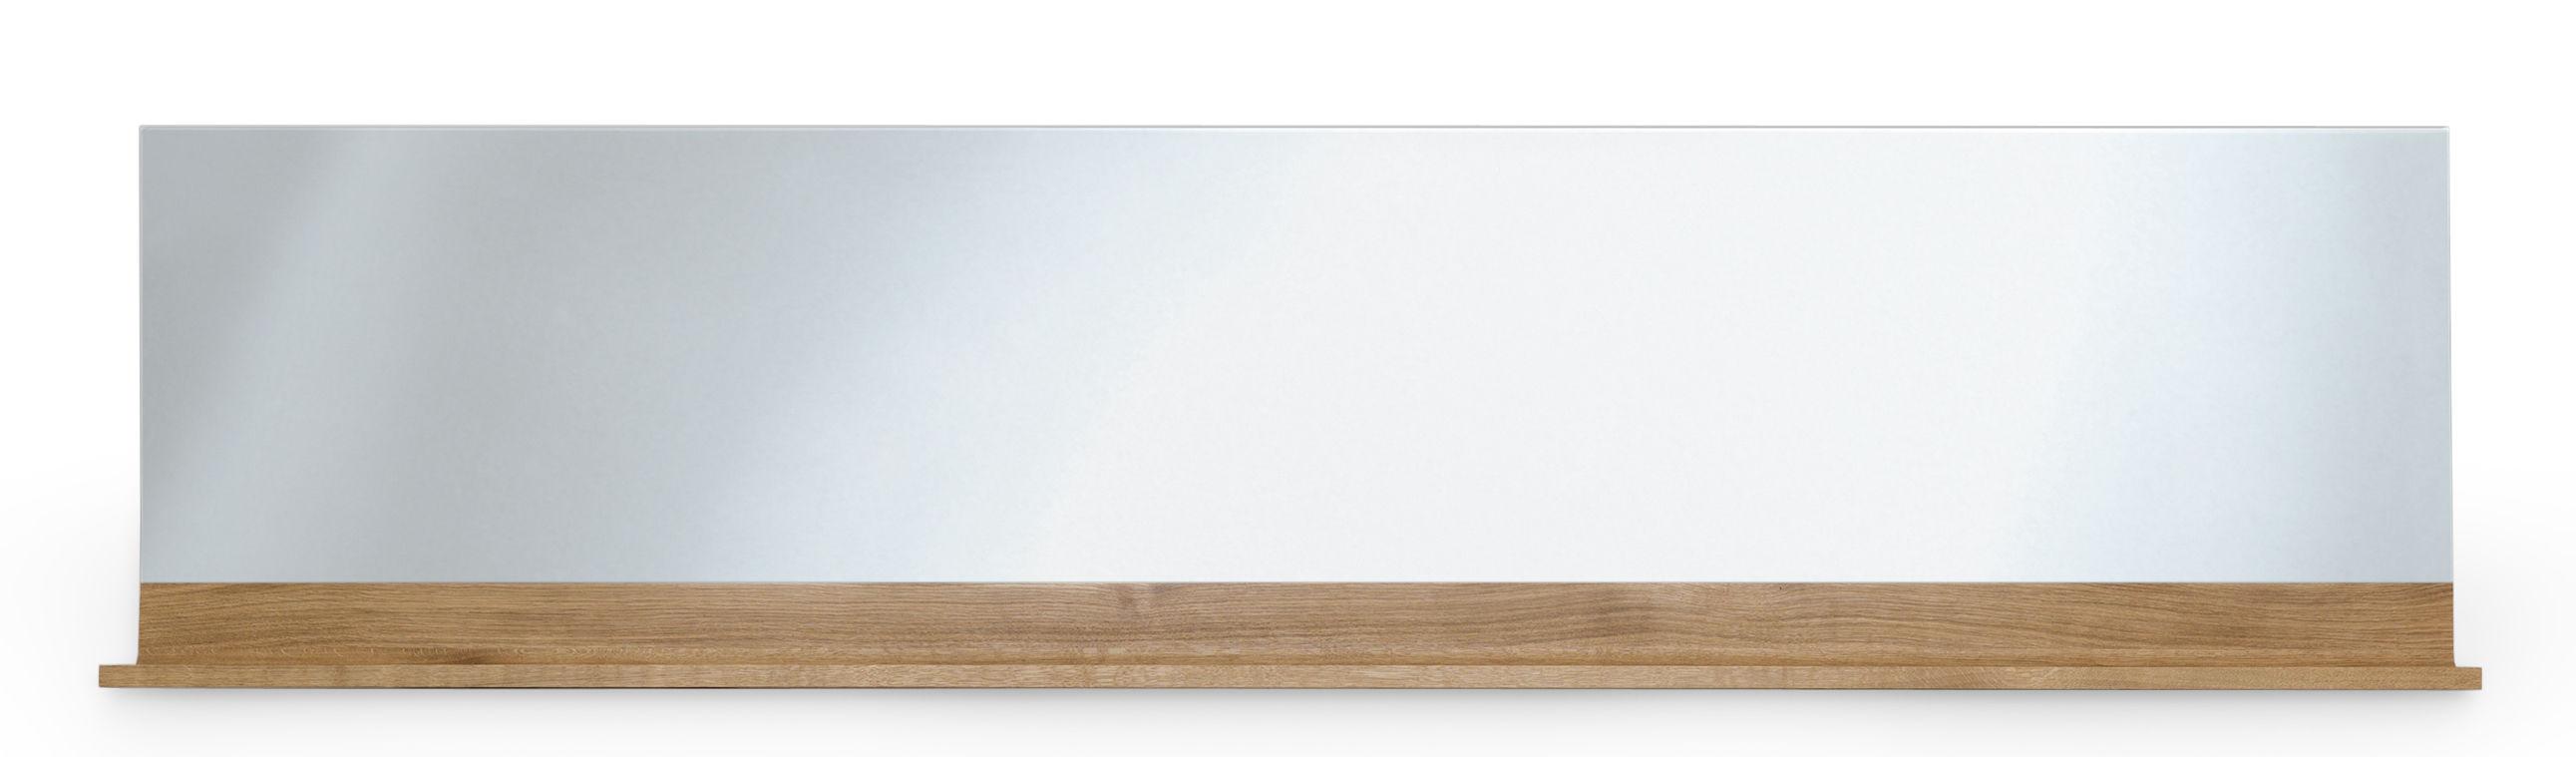 Miroir antlitz horizontal l 228 cm horizontal ch ne naturel zeitraum for Miroir horizontal